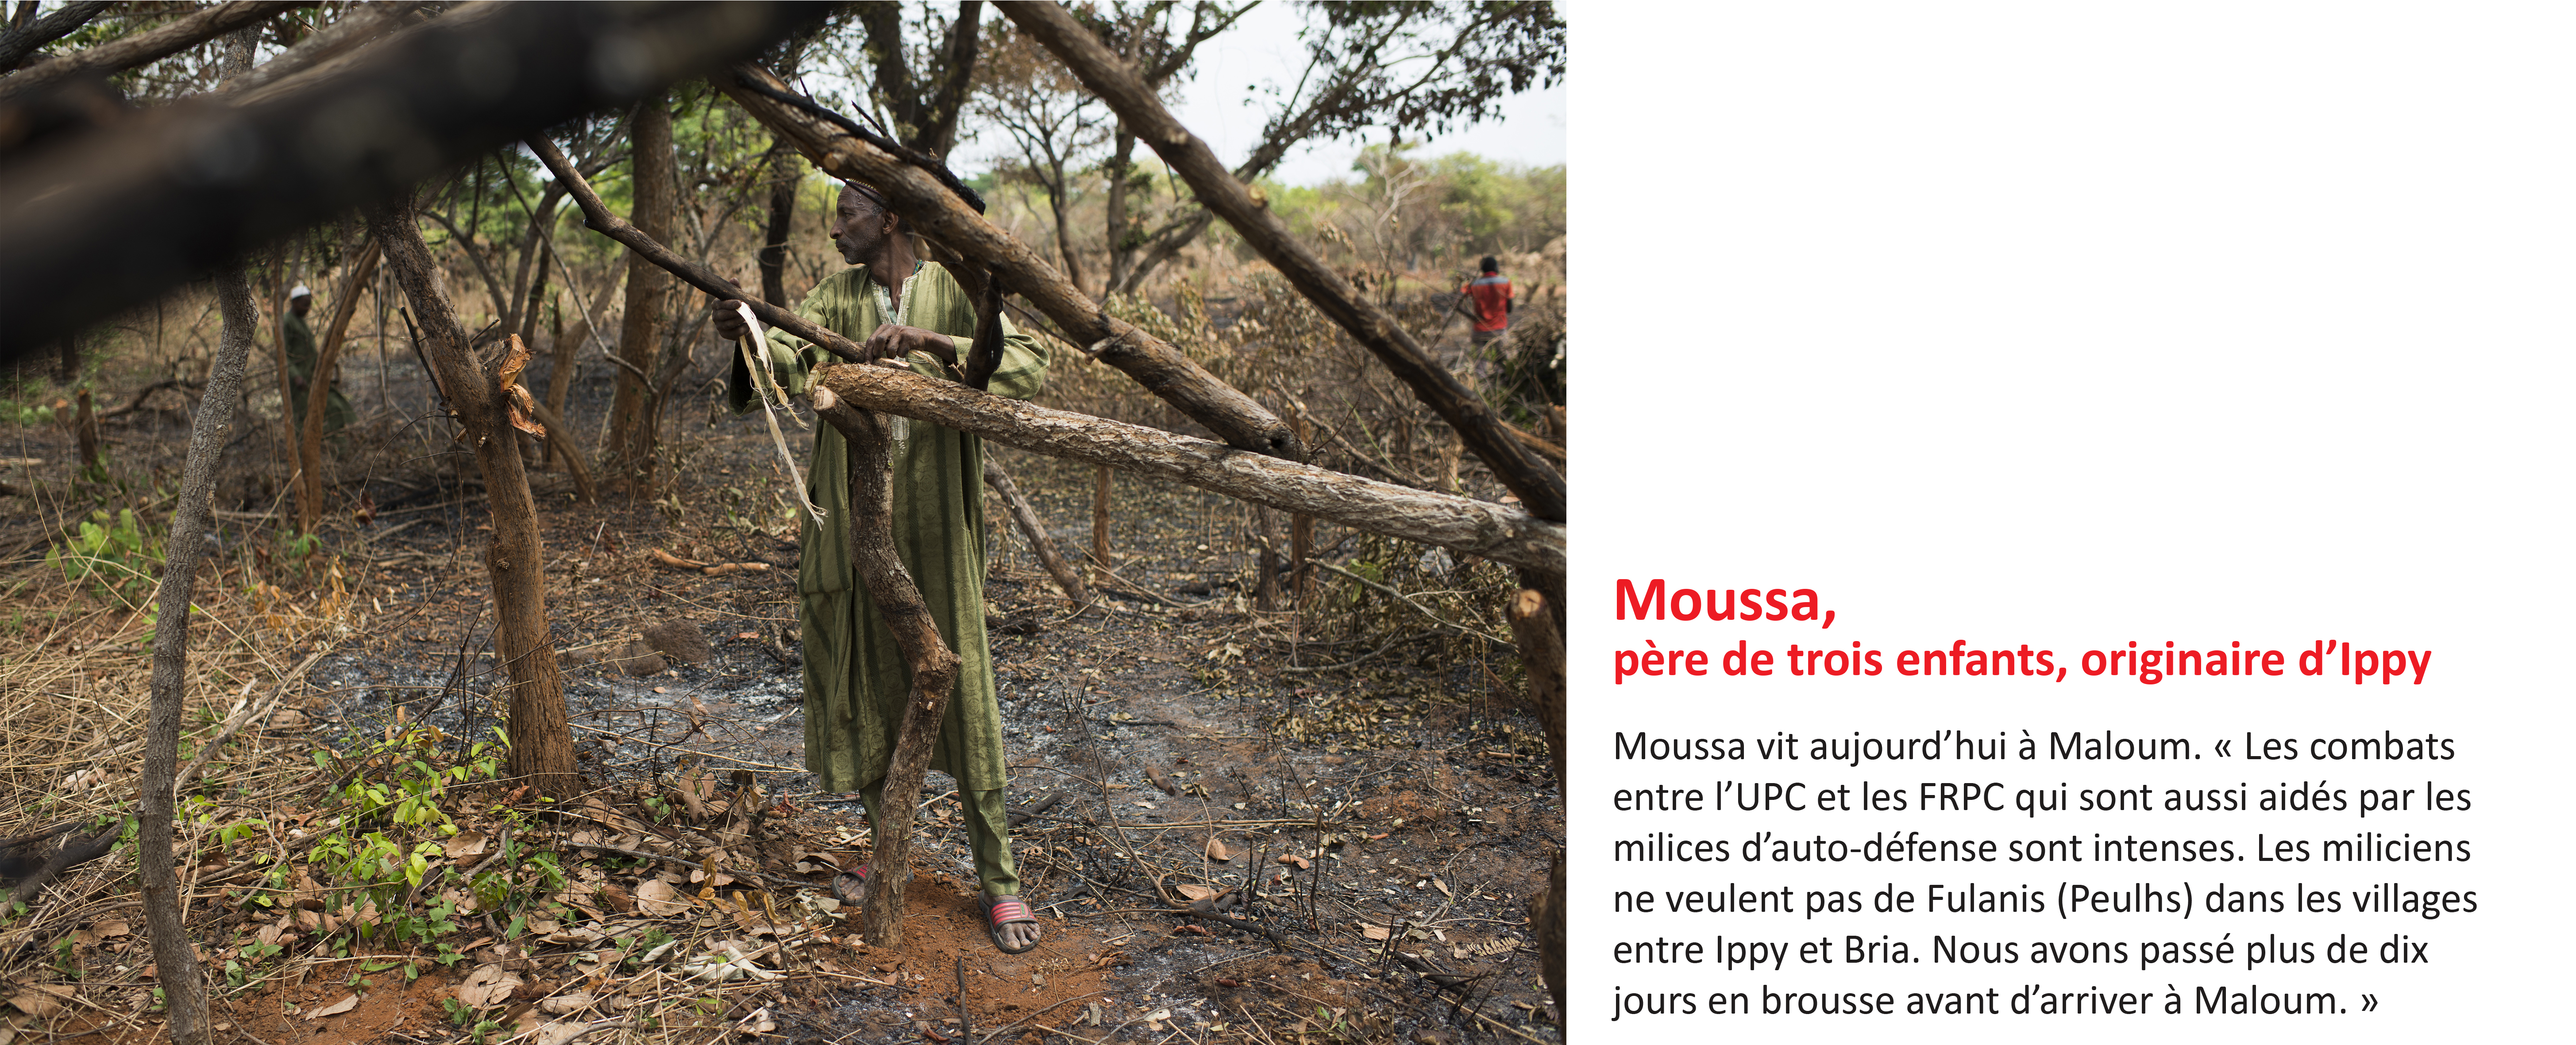 moussadef-1493203875-64.jpg